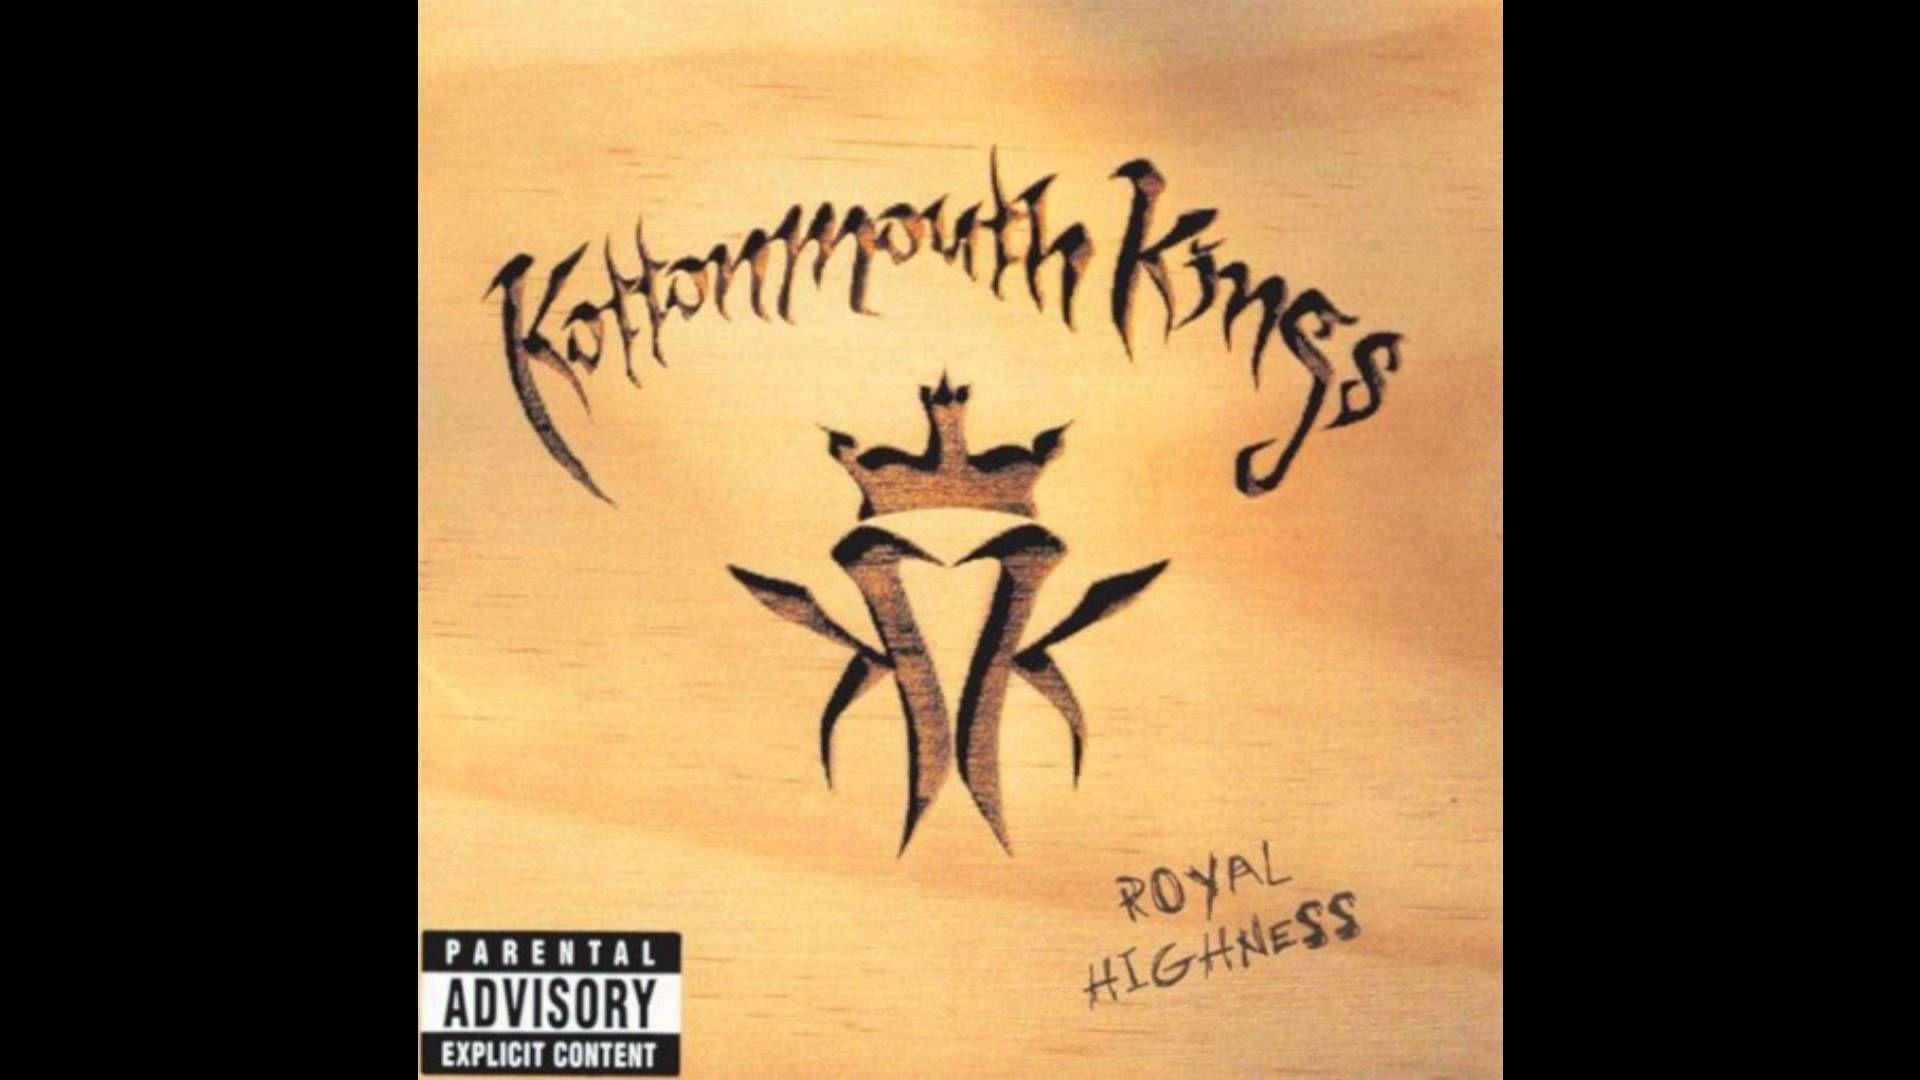 Kottonmouth Kings Royal Highness Suburban Life Royal Music Lp Vinyl